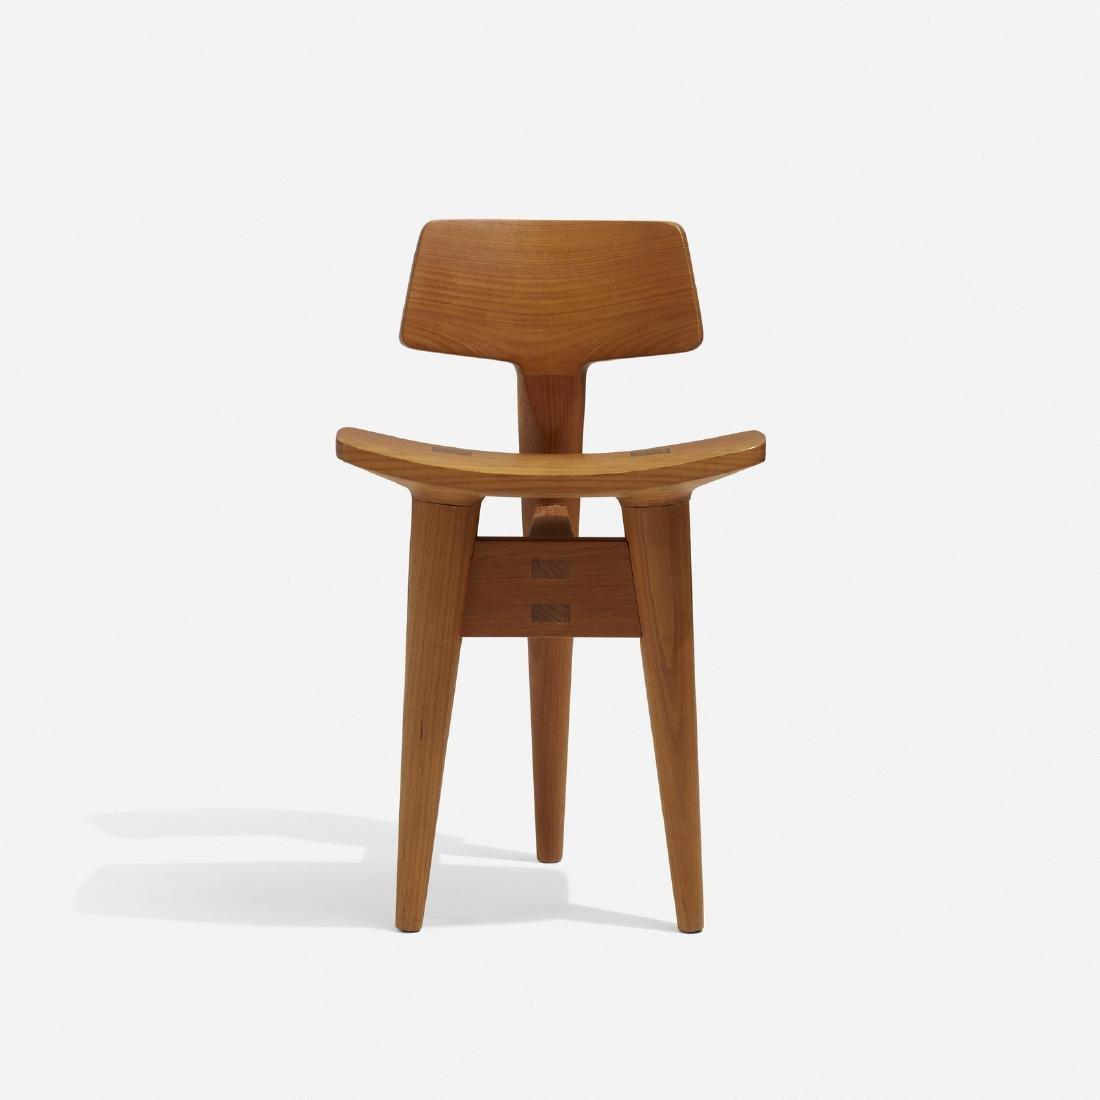 Jens Quistgaard, Sculptor's stool